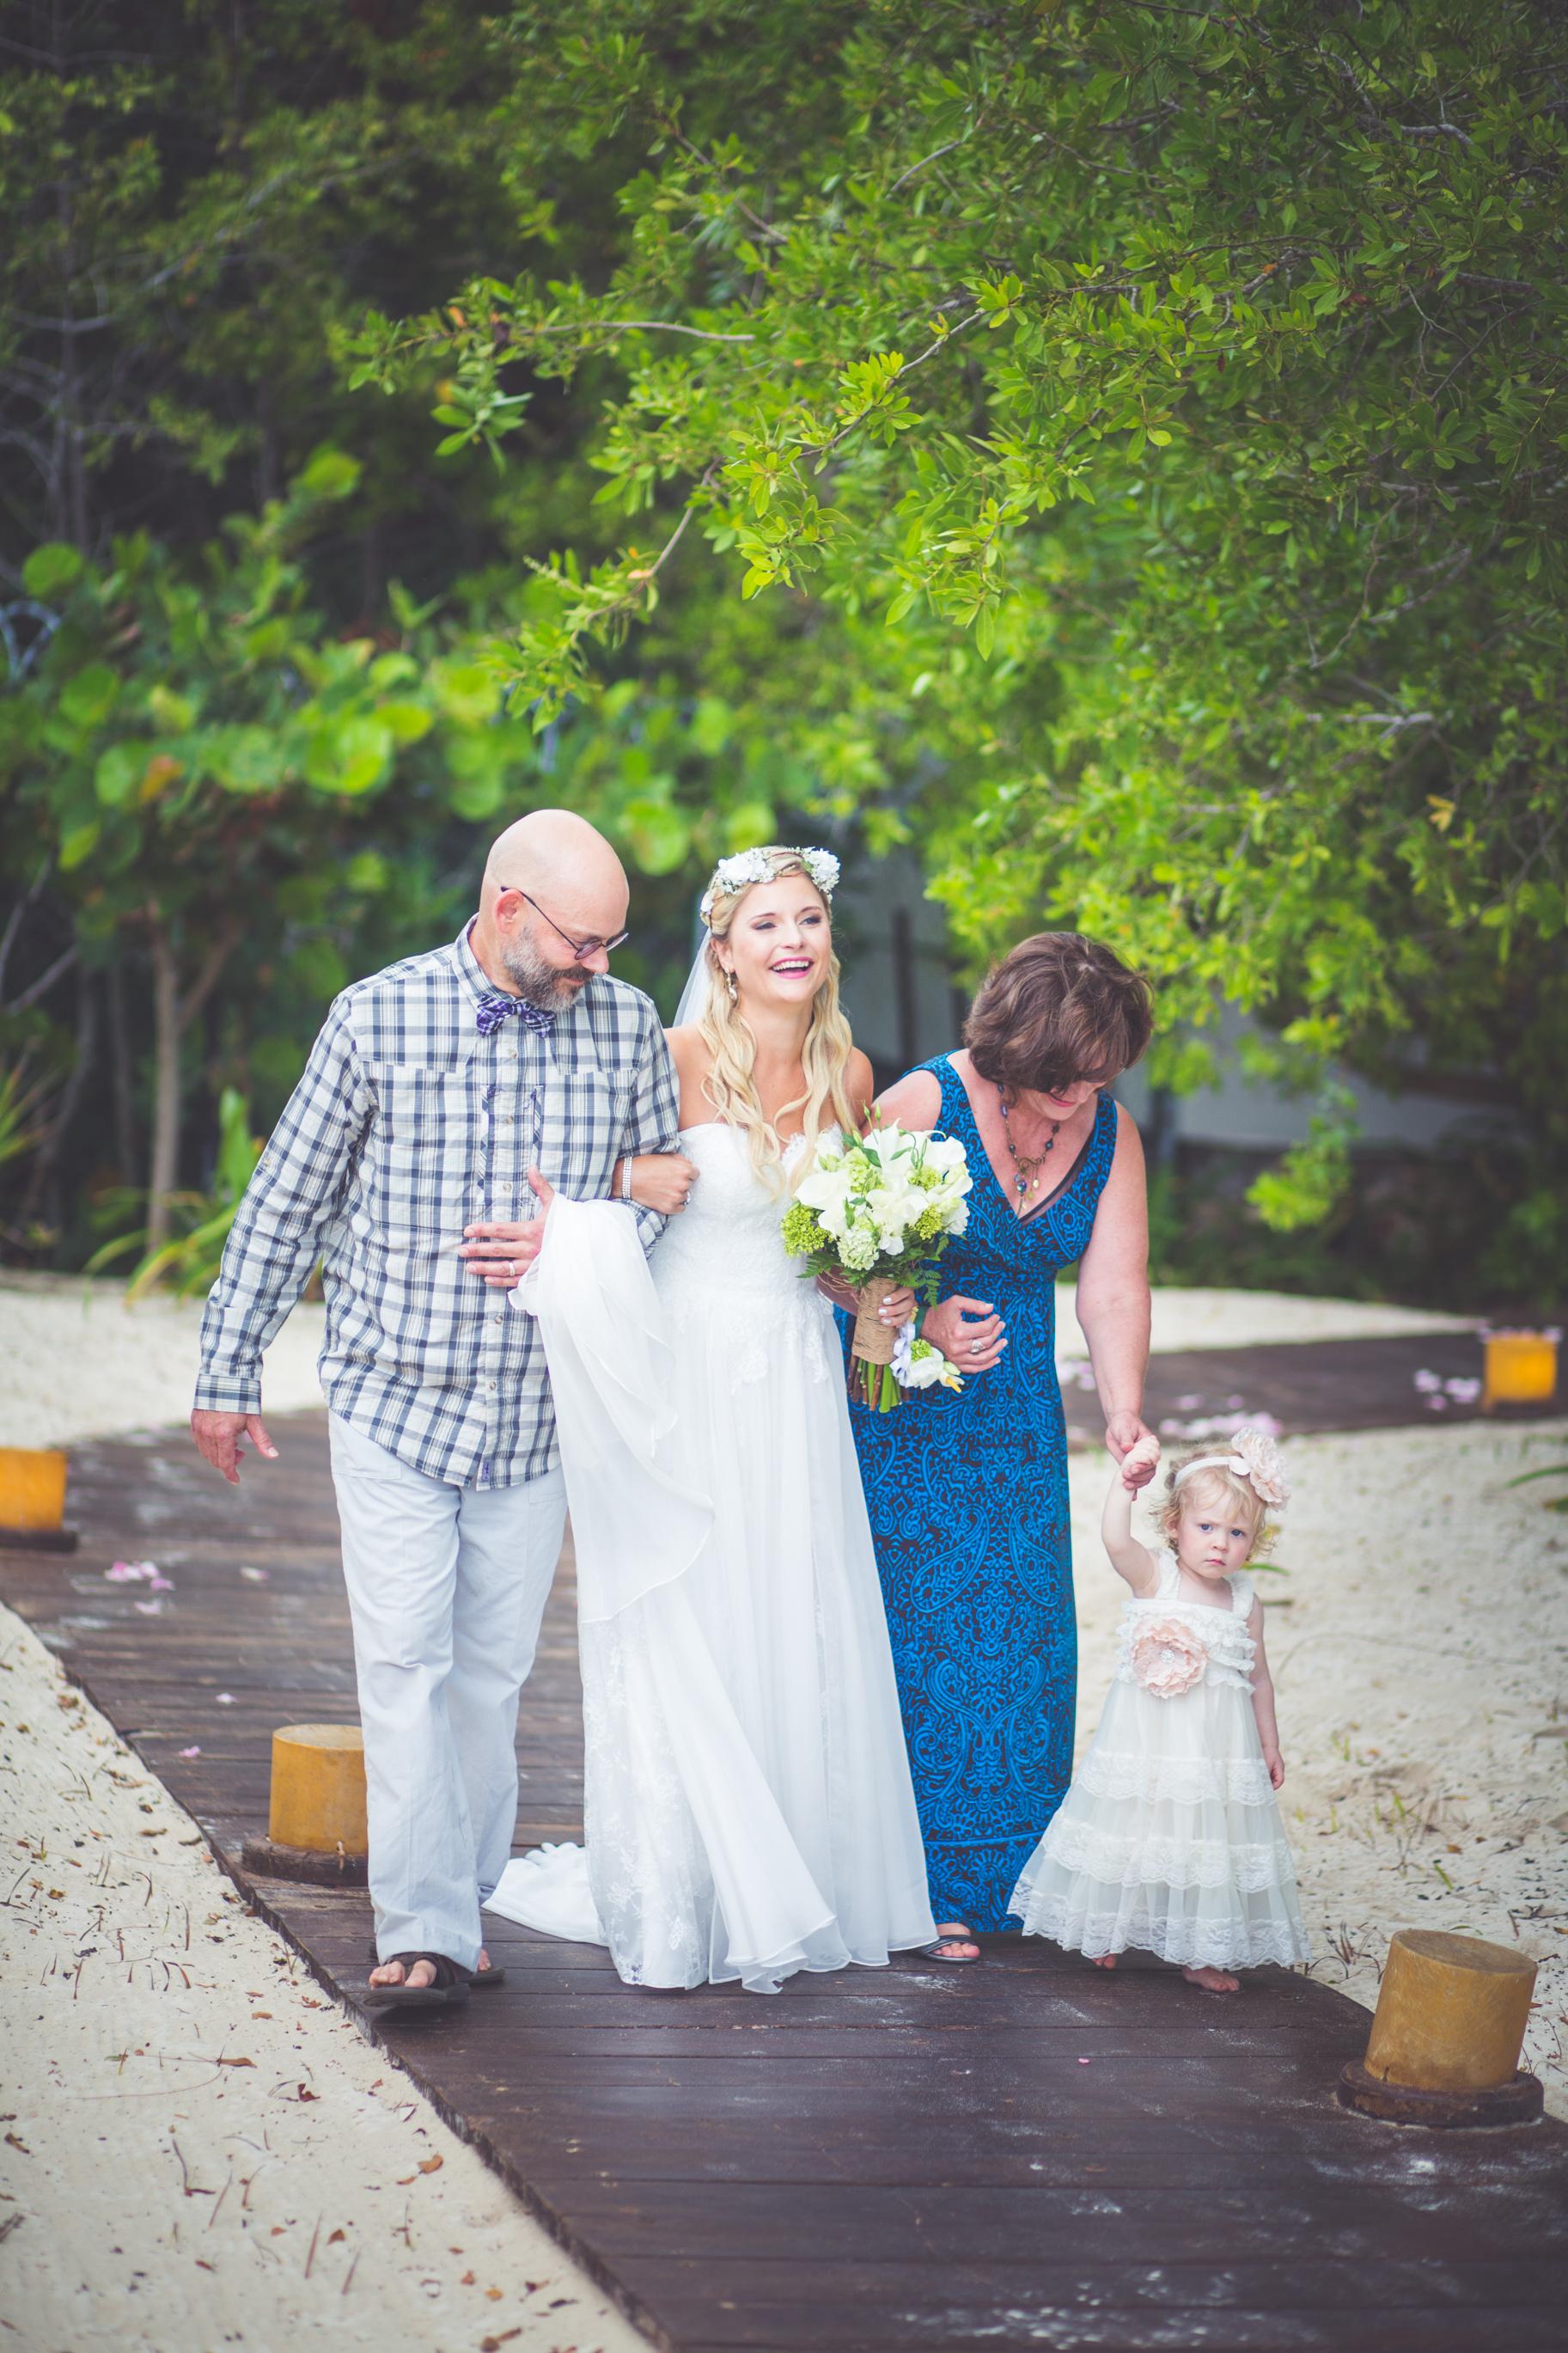 CARMEN-PETER-WEDDING-2016-90.jpg